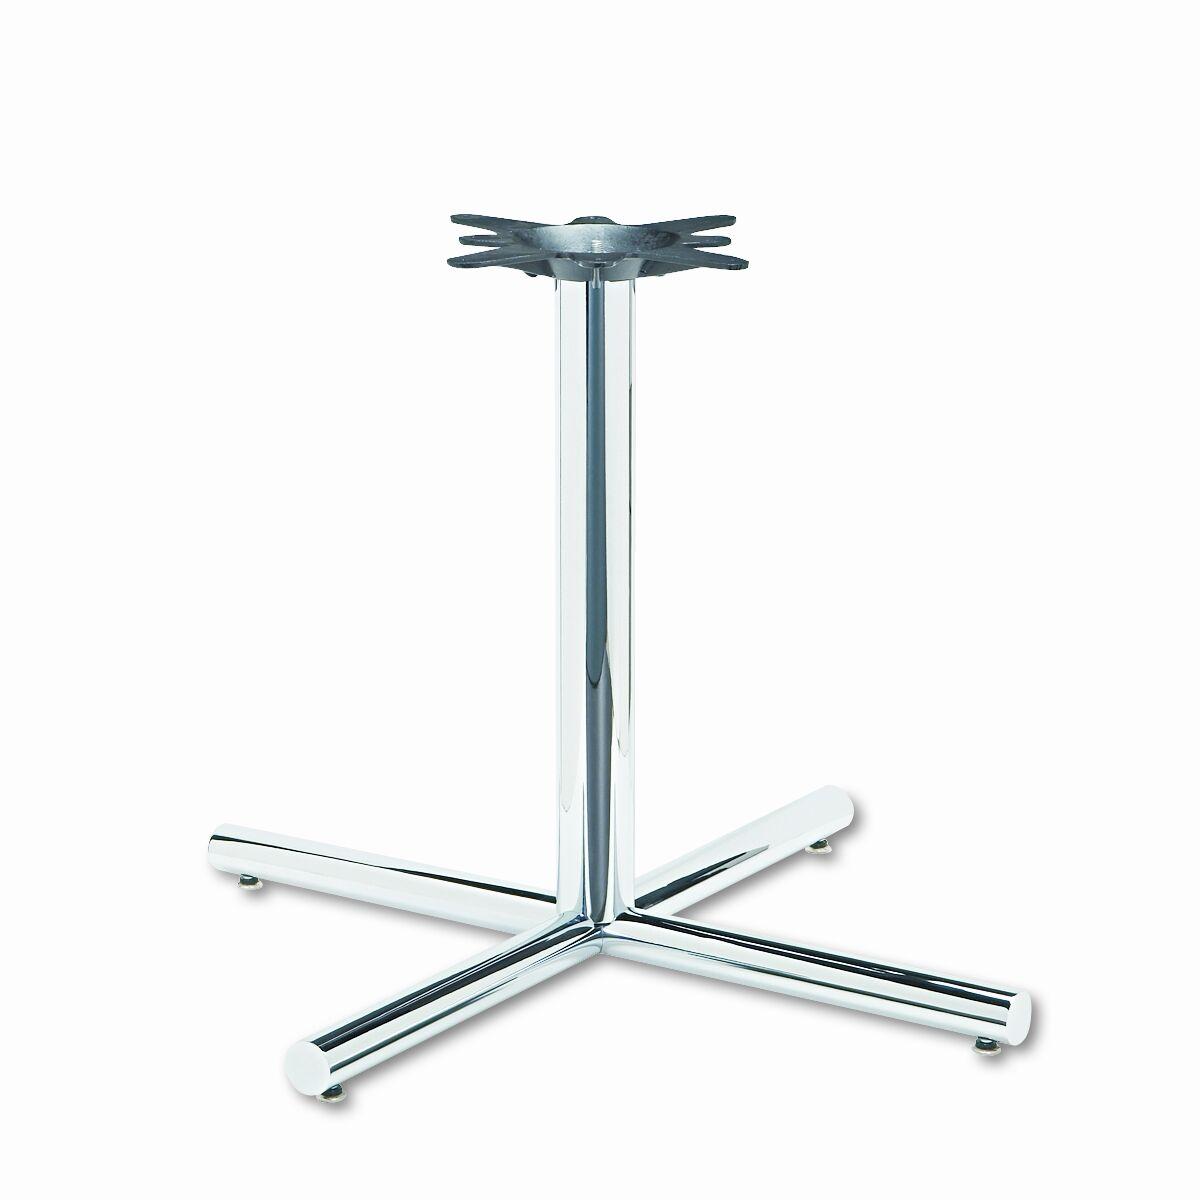 Single Column Steel Base, 36w x 36d x 27-7/8h, Chrome